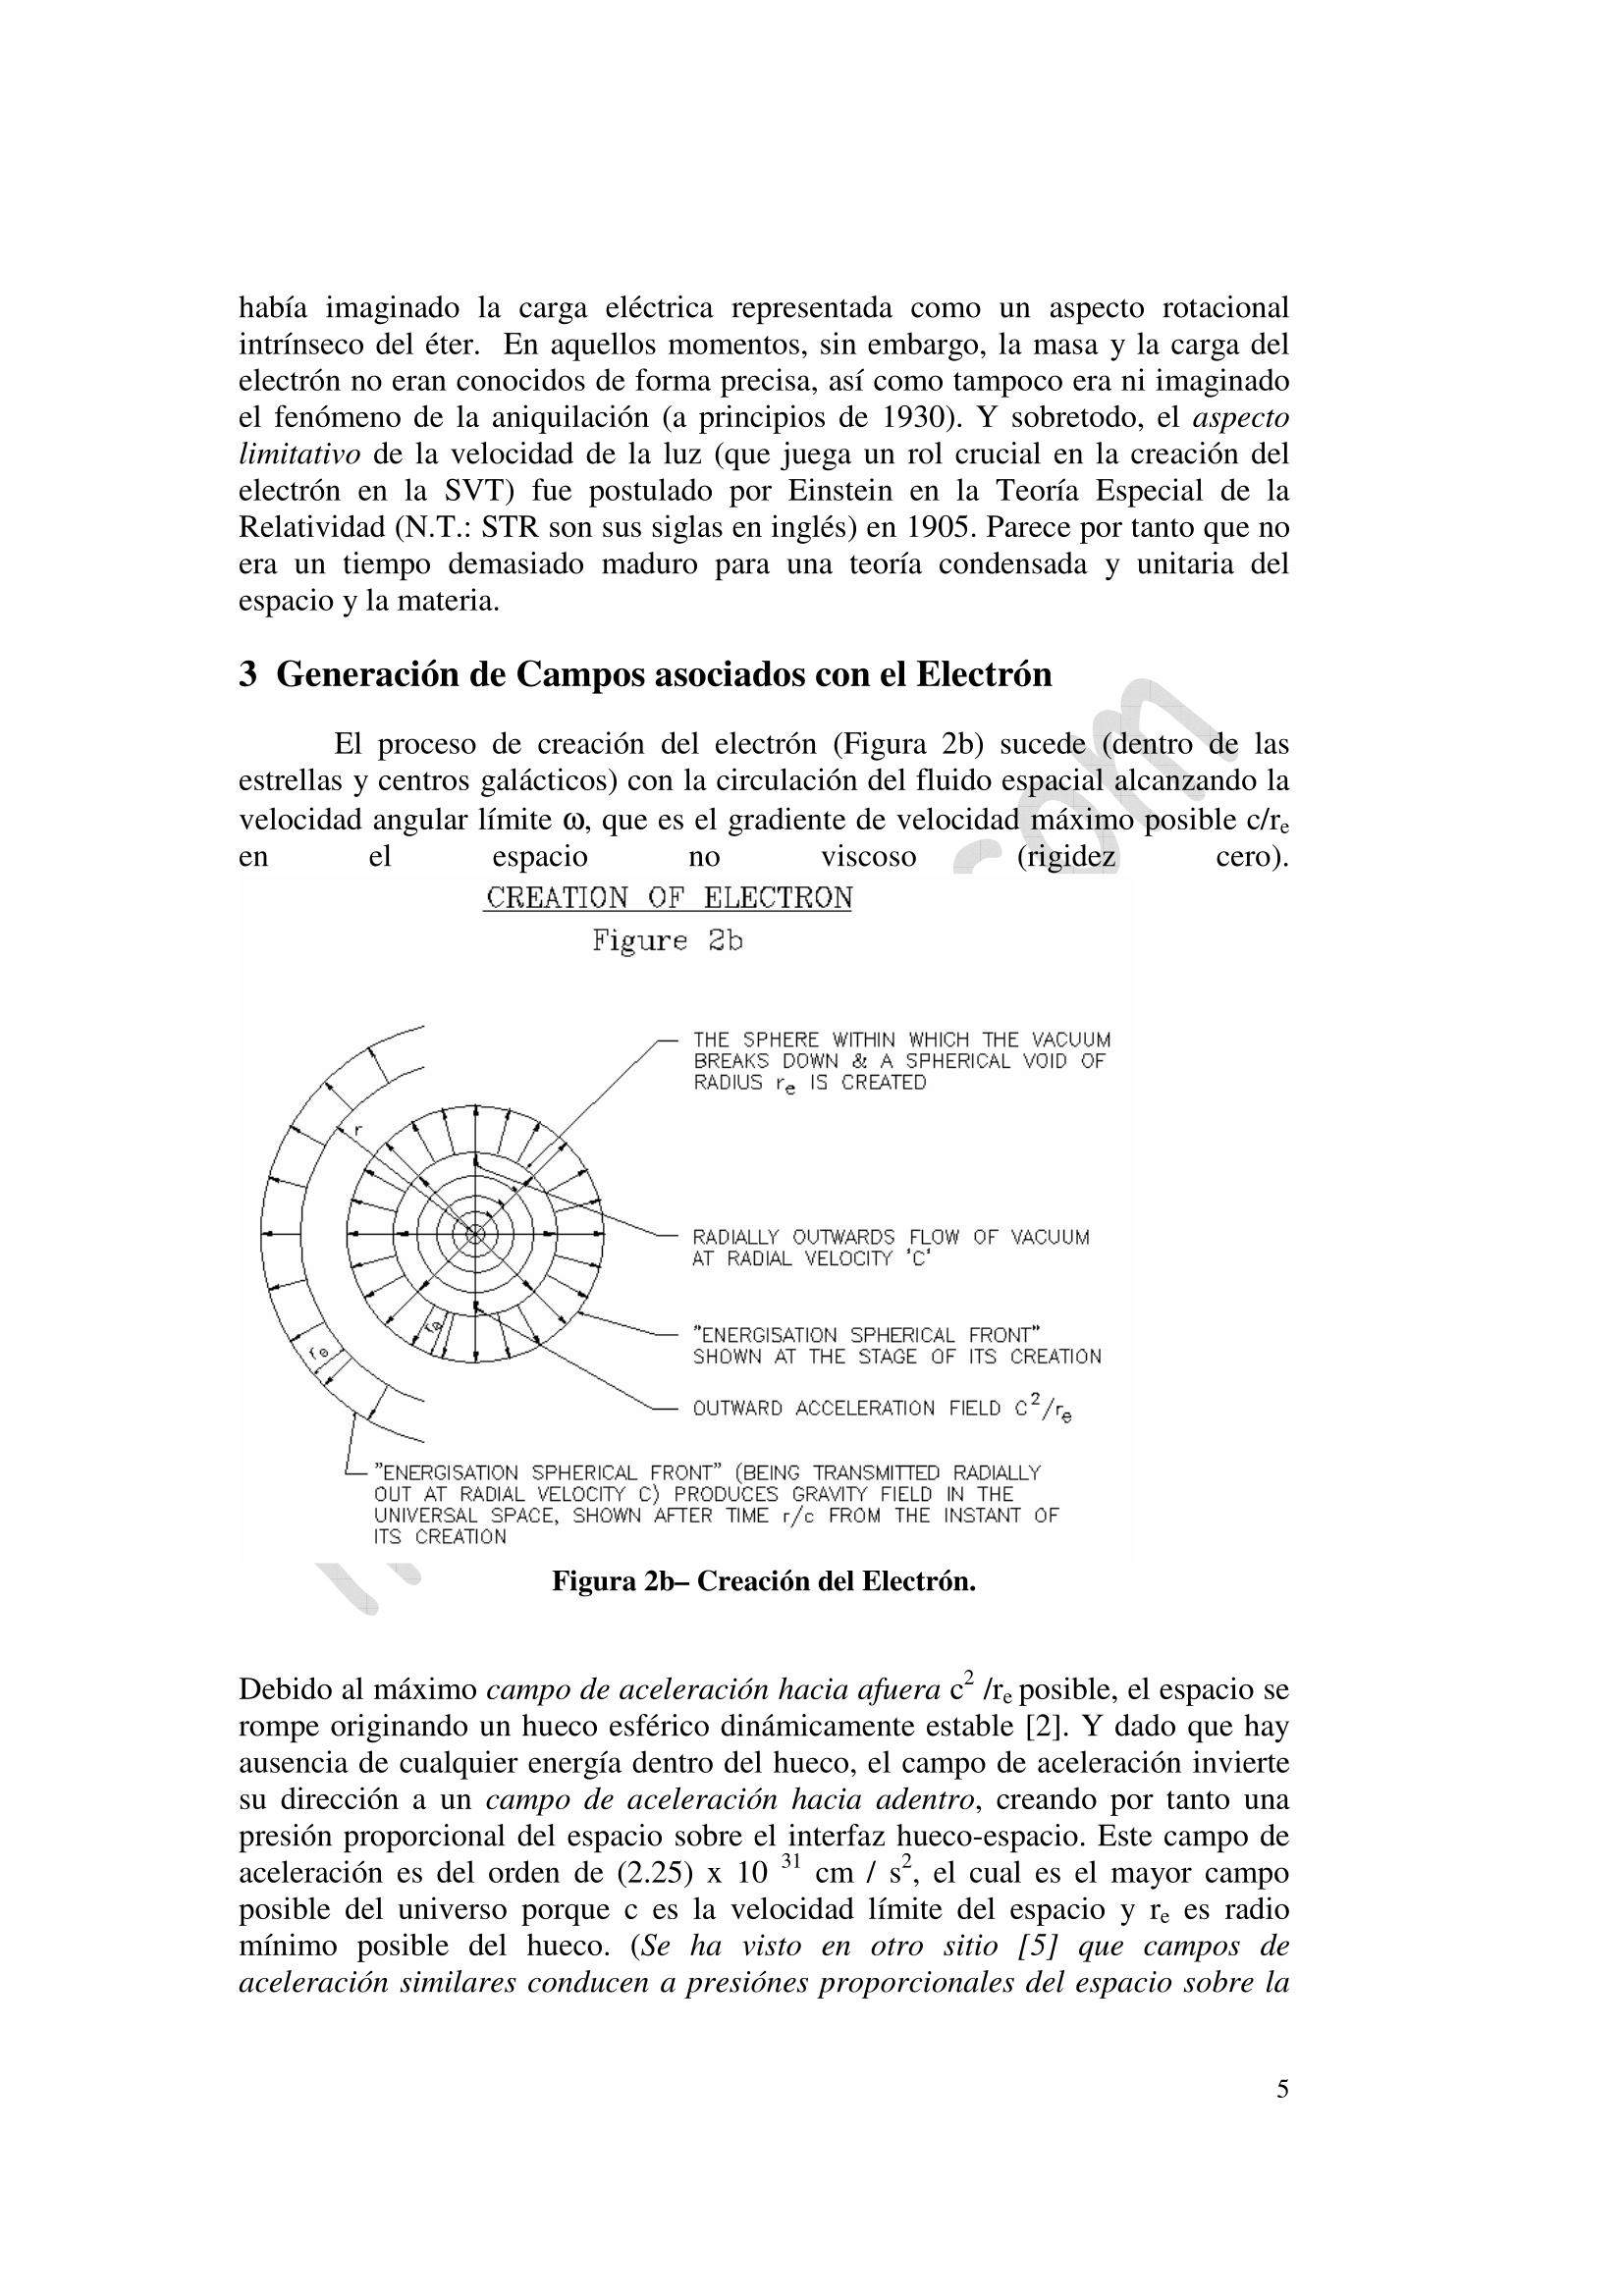 Documento3_Tewari_Espanol_2_con dibujos-05